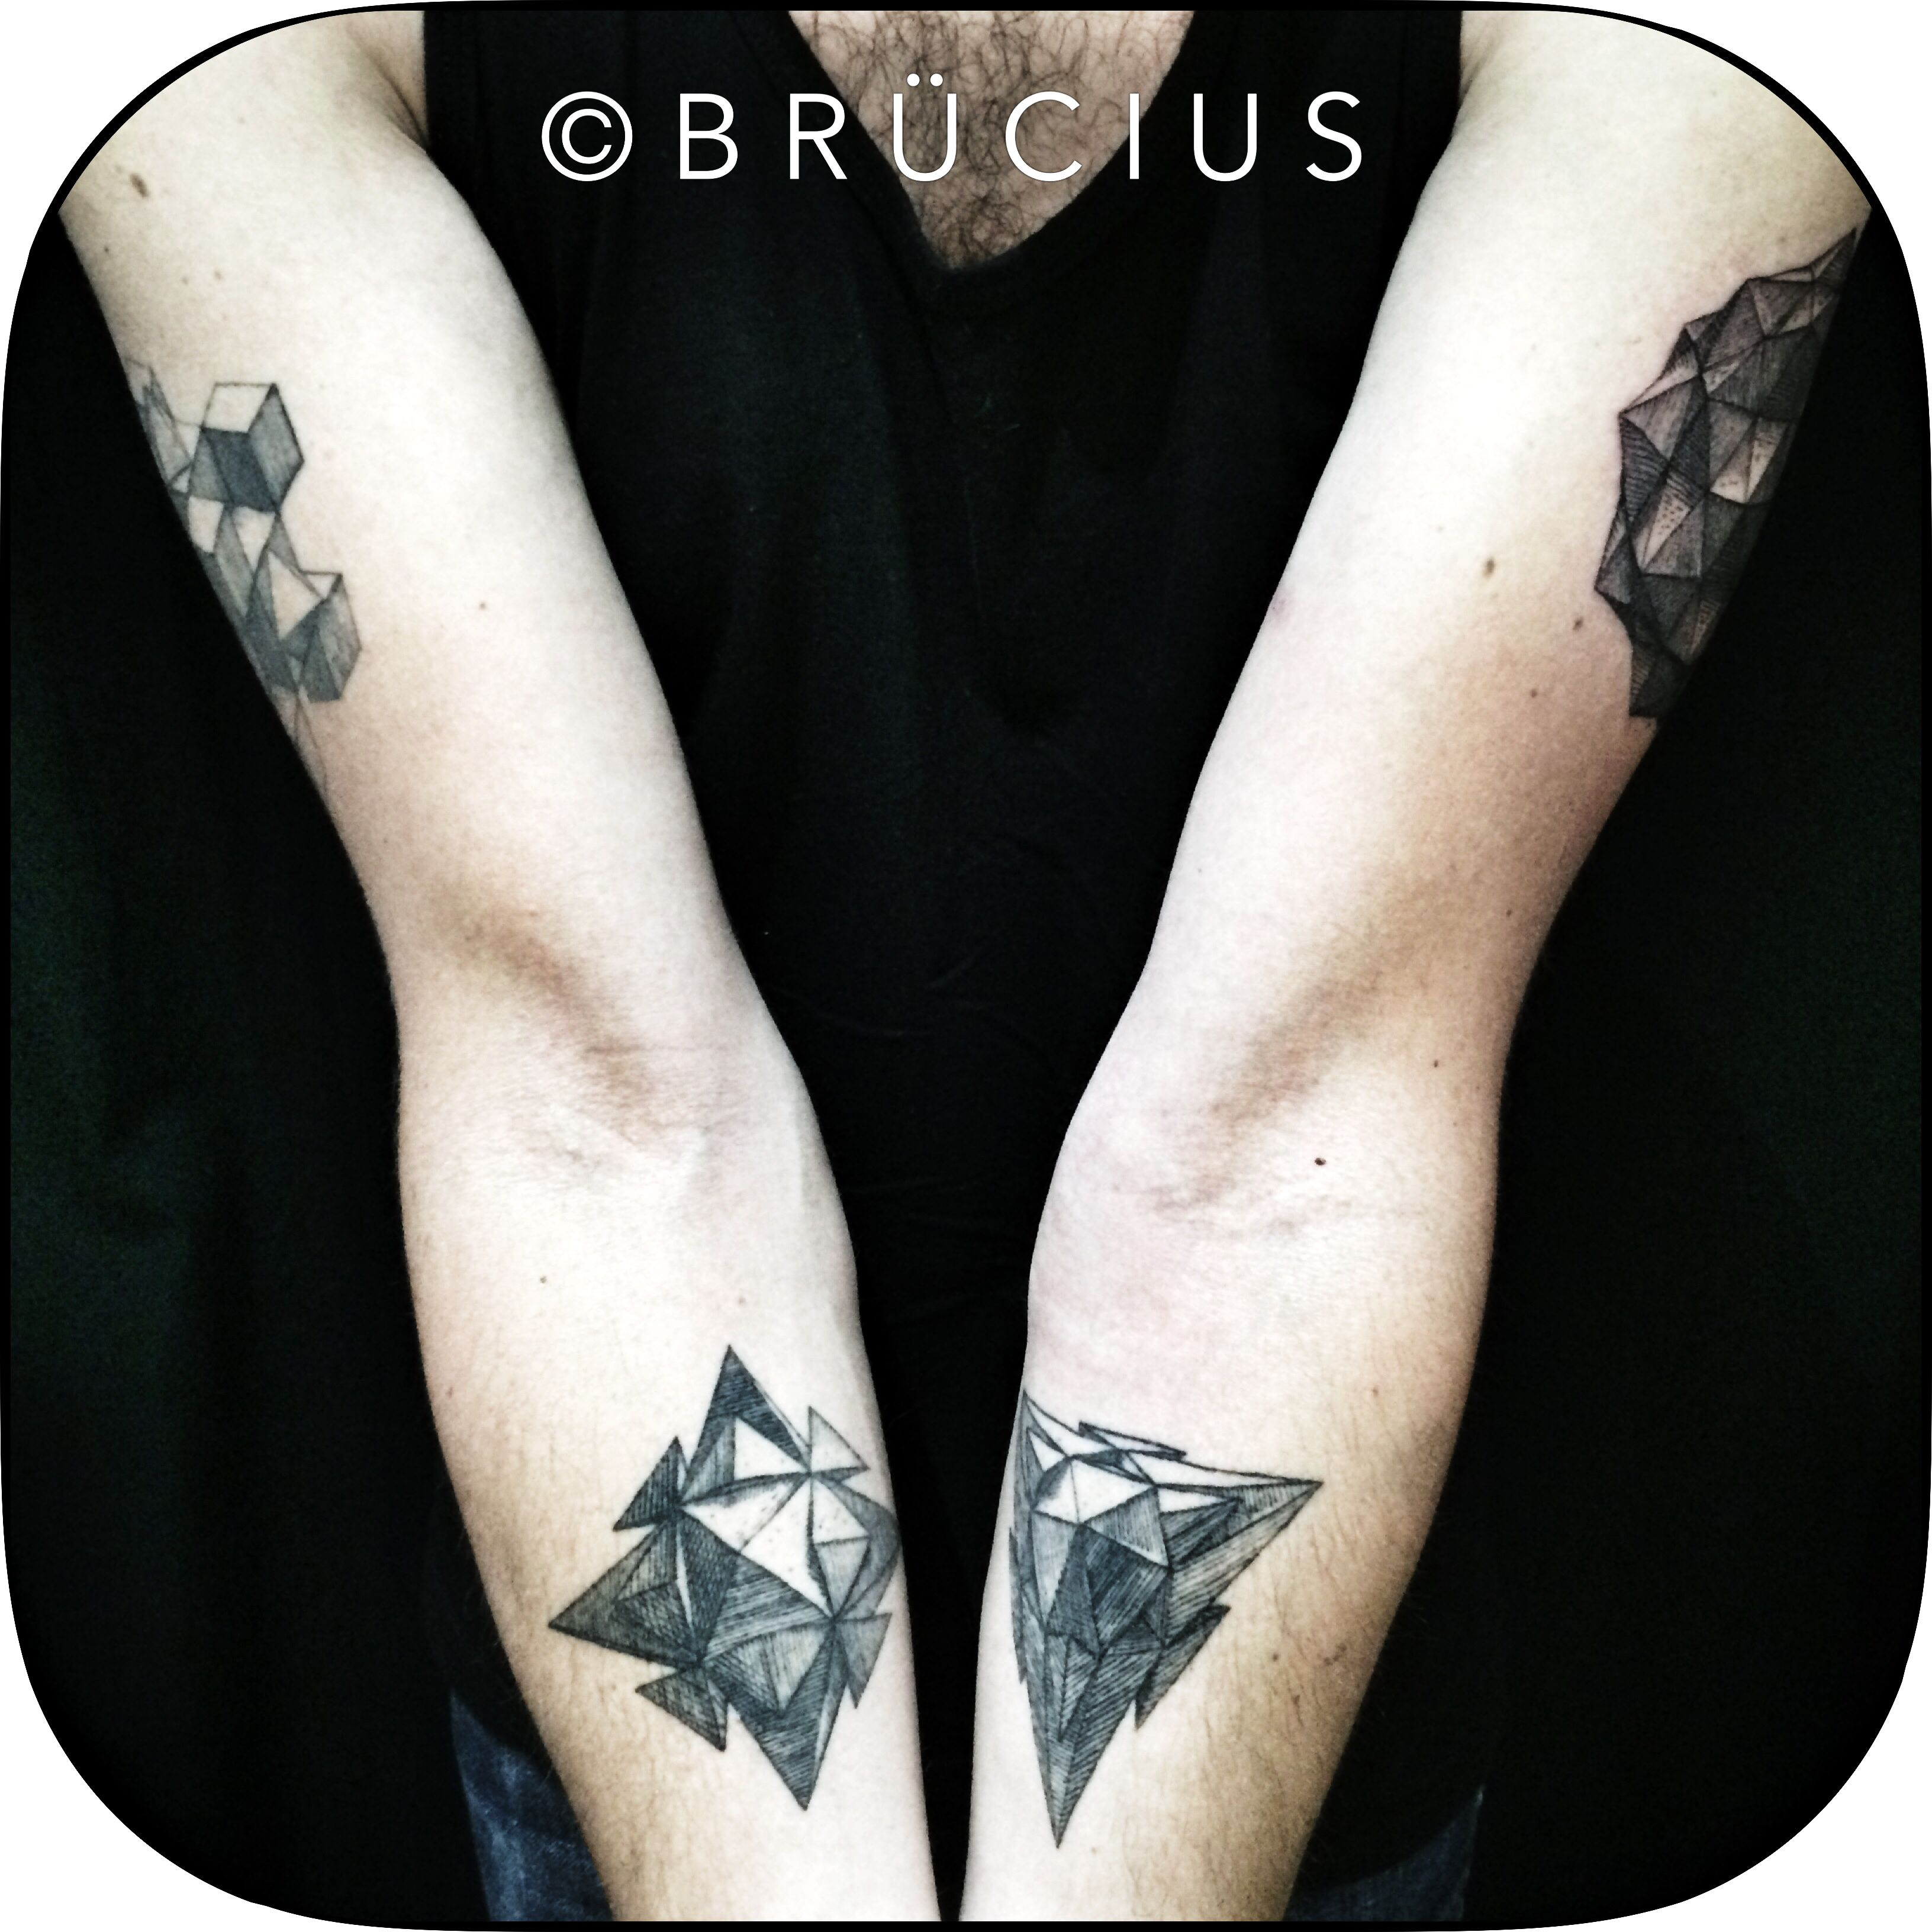 Brucius Tattoo Sf Brucius Engraving Lines Woodcut Etching Geometry Solids Wenzel Jamnitz Blue Tattoo Tattoos San Francisco Tattoo Artists